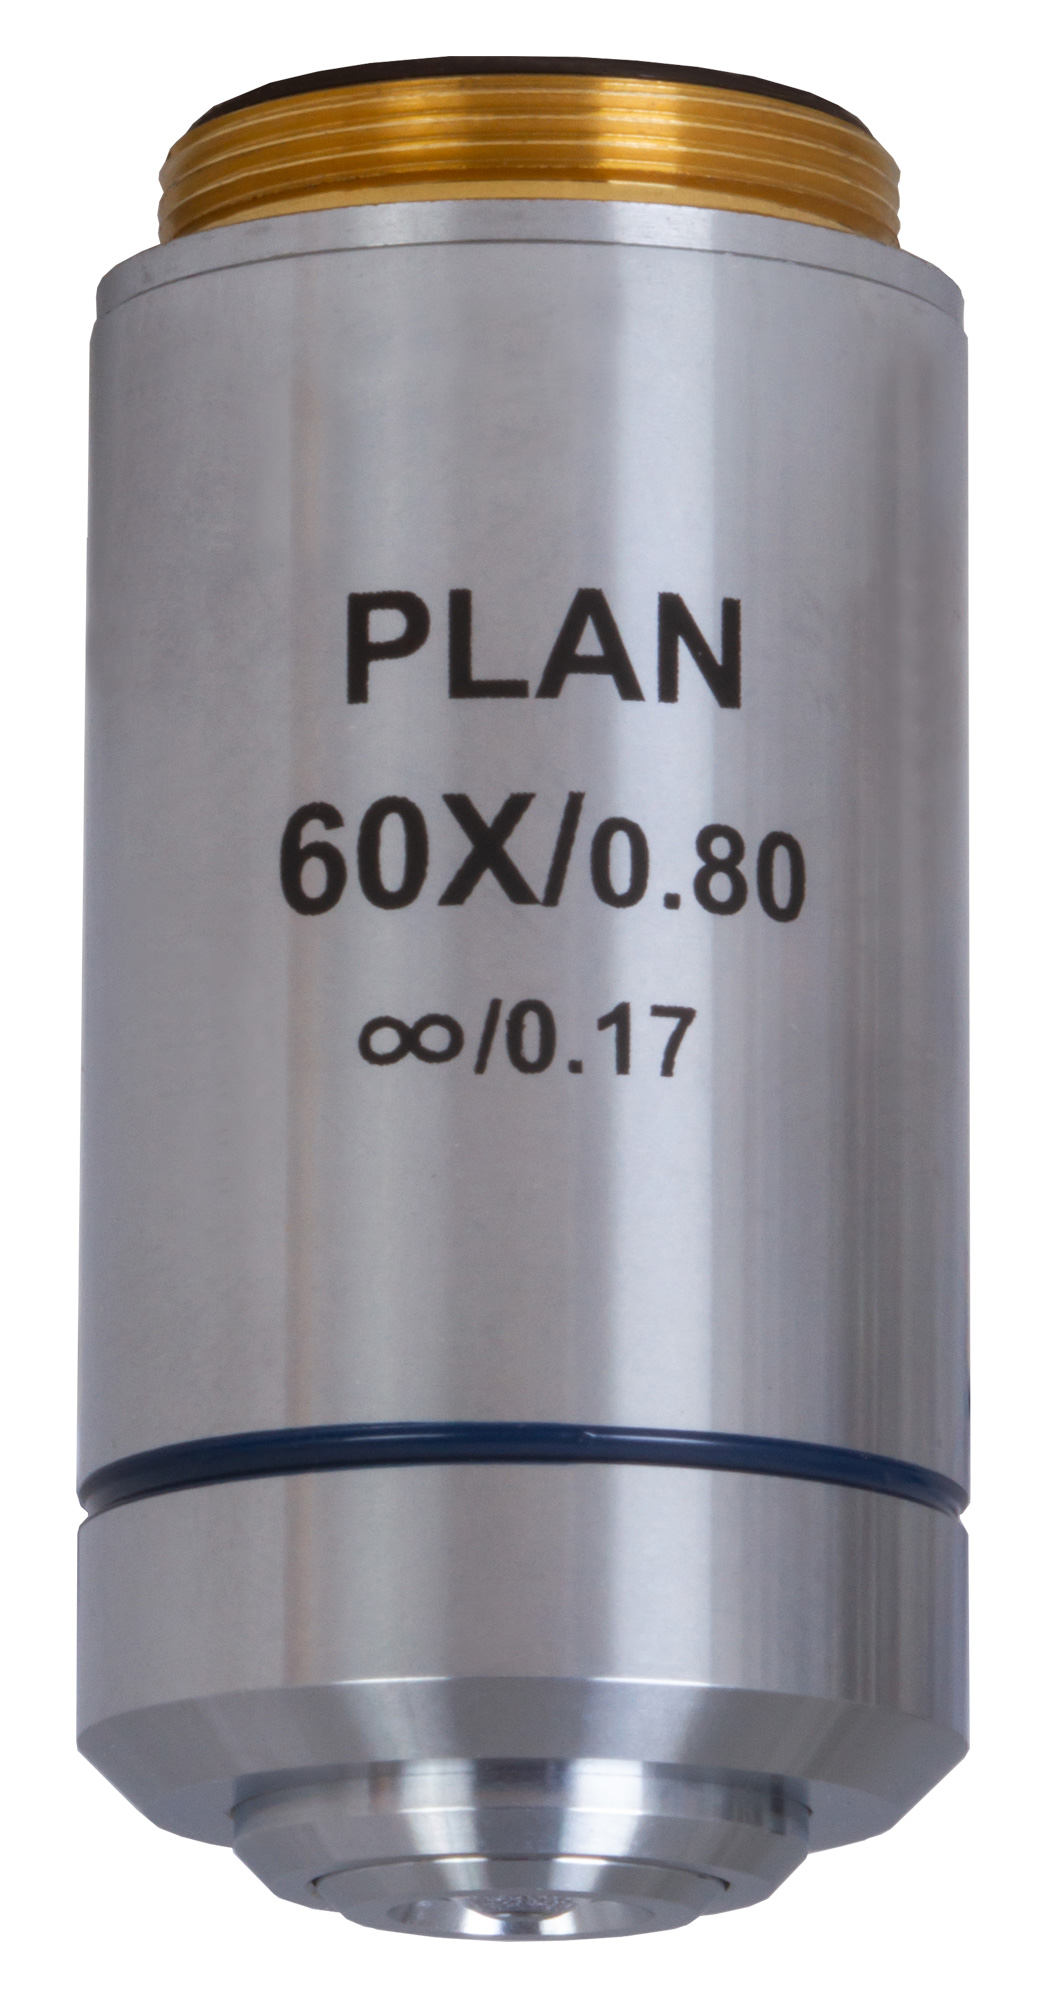 Объектив планахроматический Levenhuk (Левенгук) MED 60x/беск фото